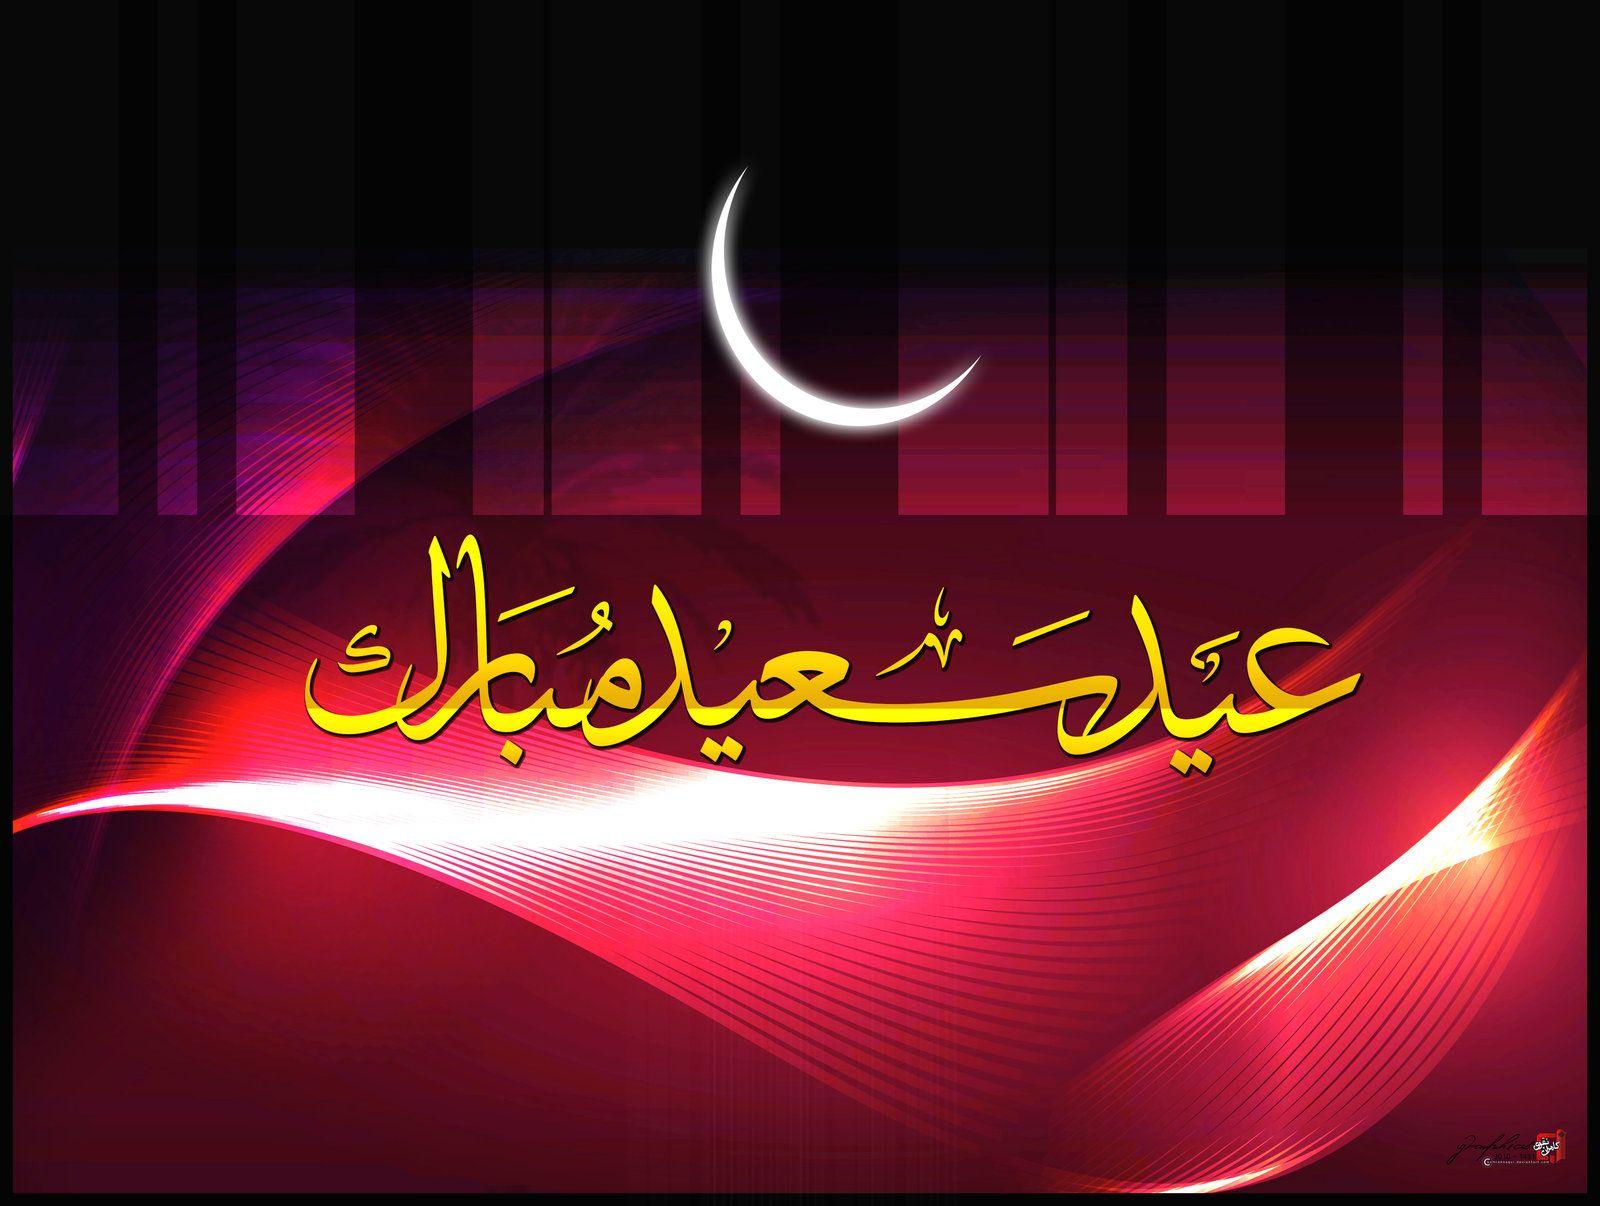 Wallpaper download eid - Eid Mubarak Hd Wallpaper 2015 For Desktop Free Download Ramadan Mubarak 2015 Ramadan Kareem Wallpapers Pictures Photos Eid Mubarak Collection